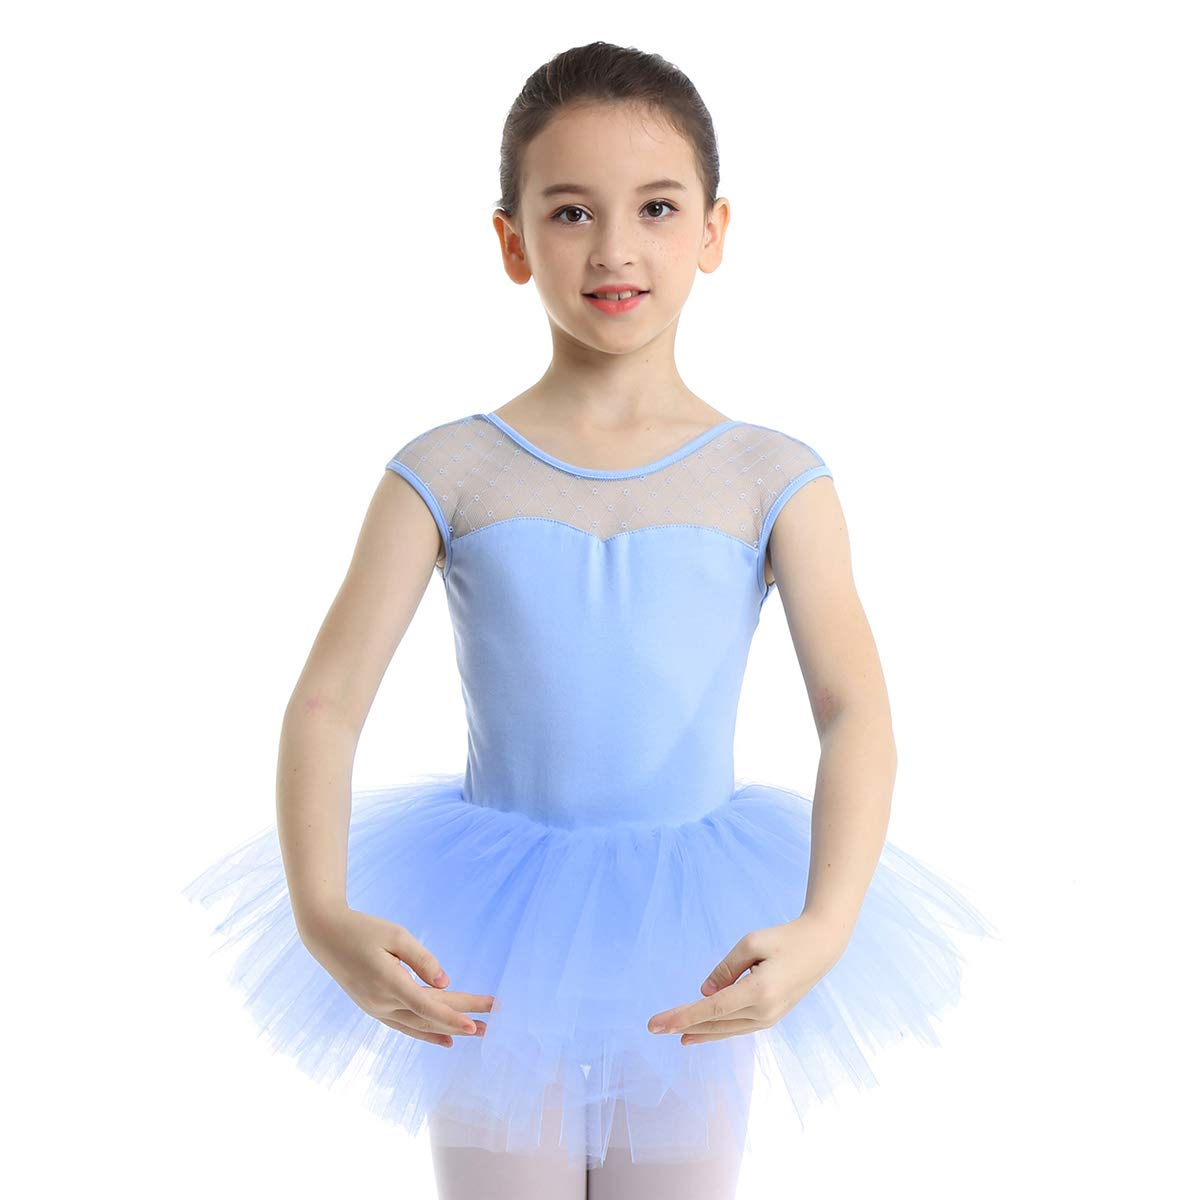 MSemis Kid Girls Ballet Tutu Dress Dancewear Gymnastics Tank Top Leotard Stage Performance Lyrical Dance Costume